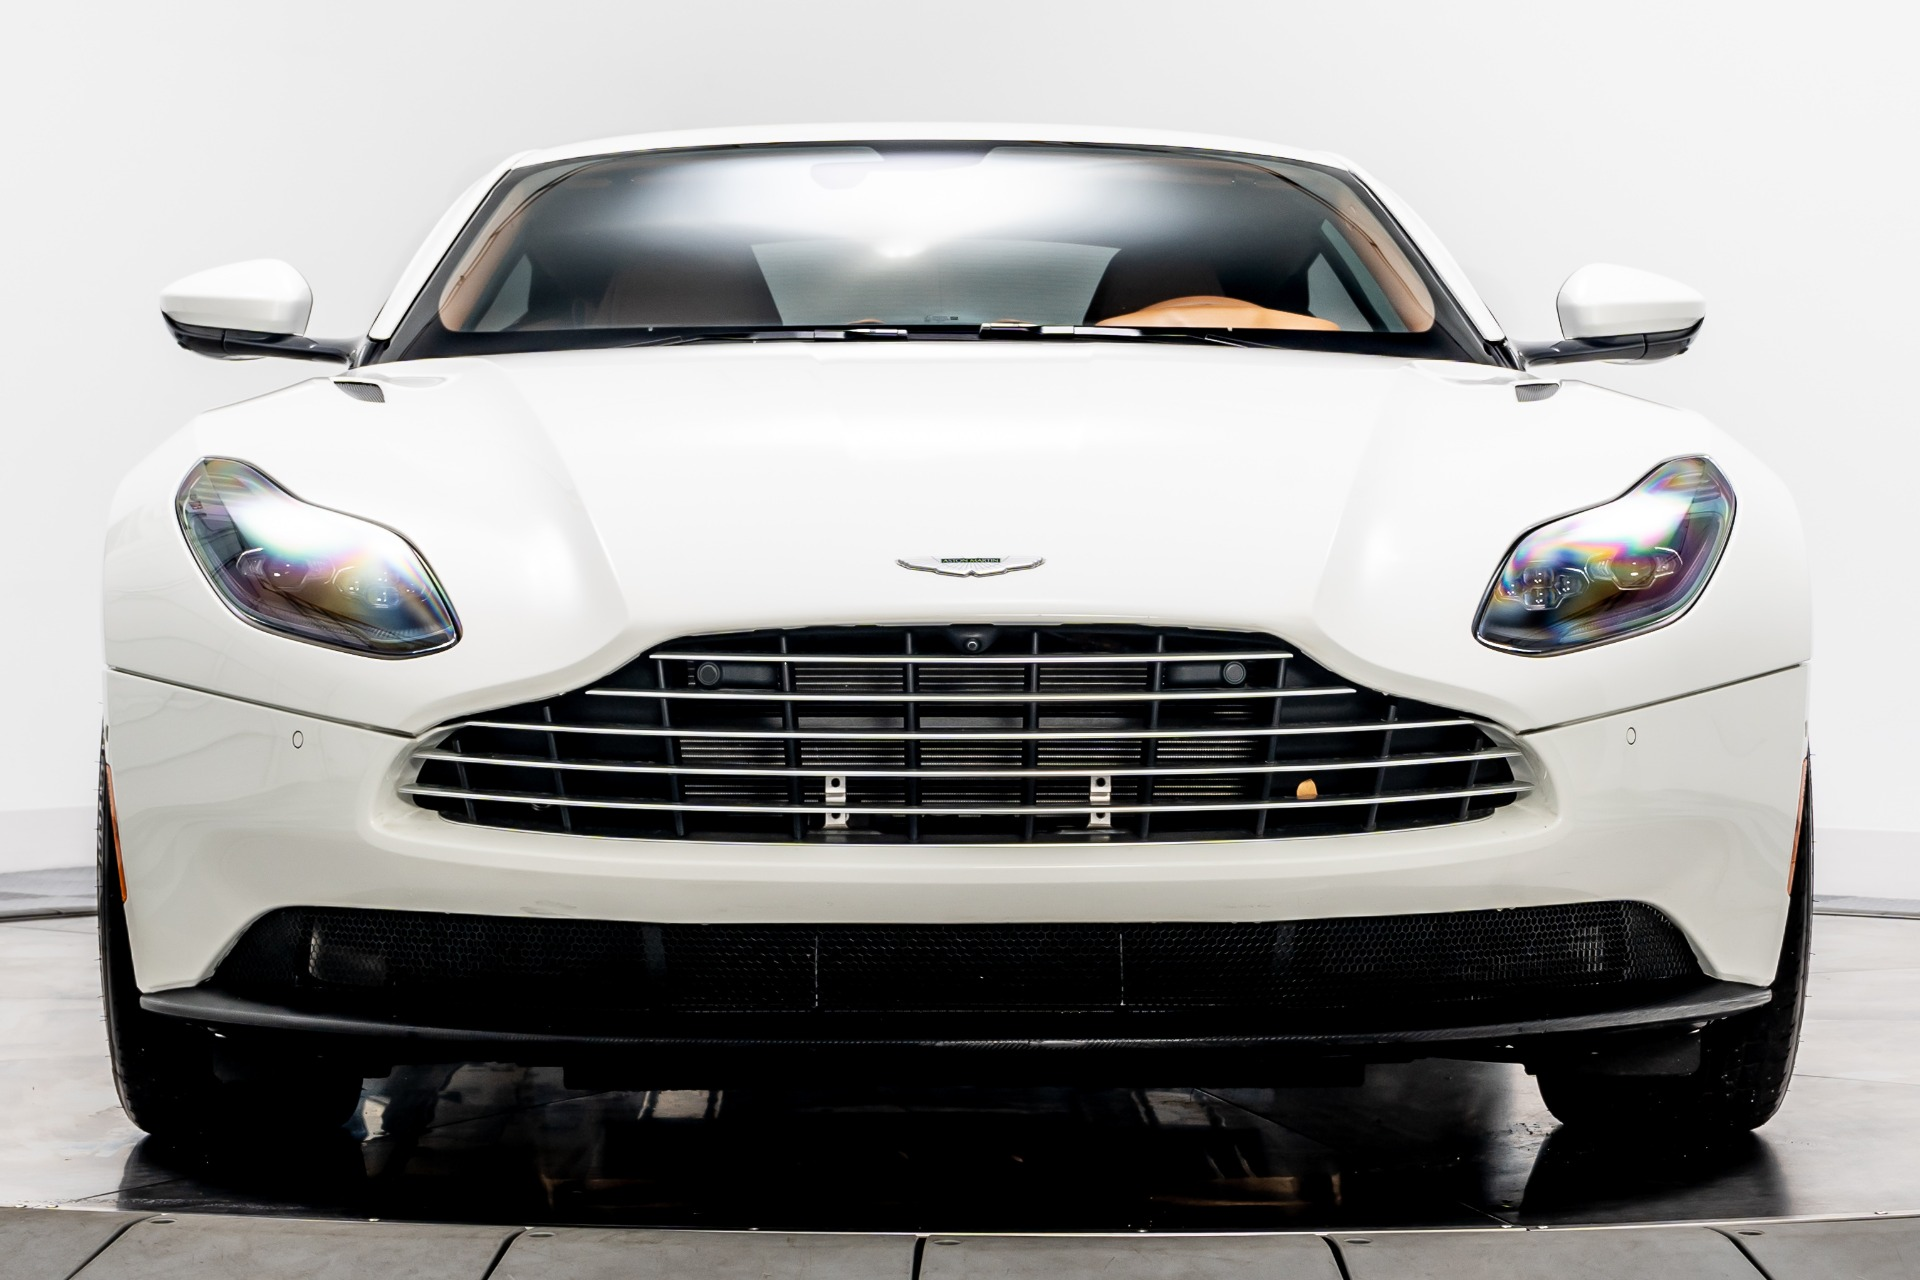 Used 2018 Aston Martin Db11 V8 For Sale Sold Marshall Goldman Beverly Hills Stock W20932